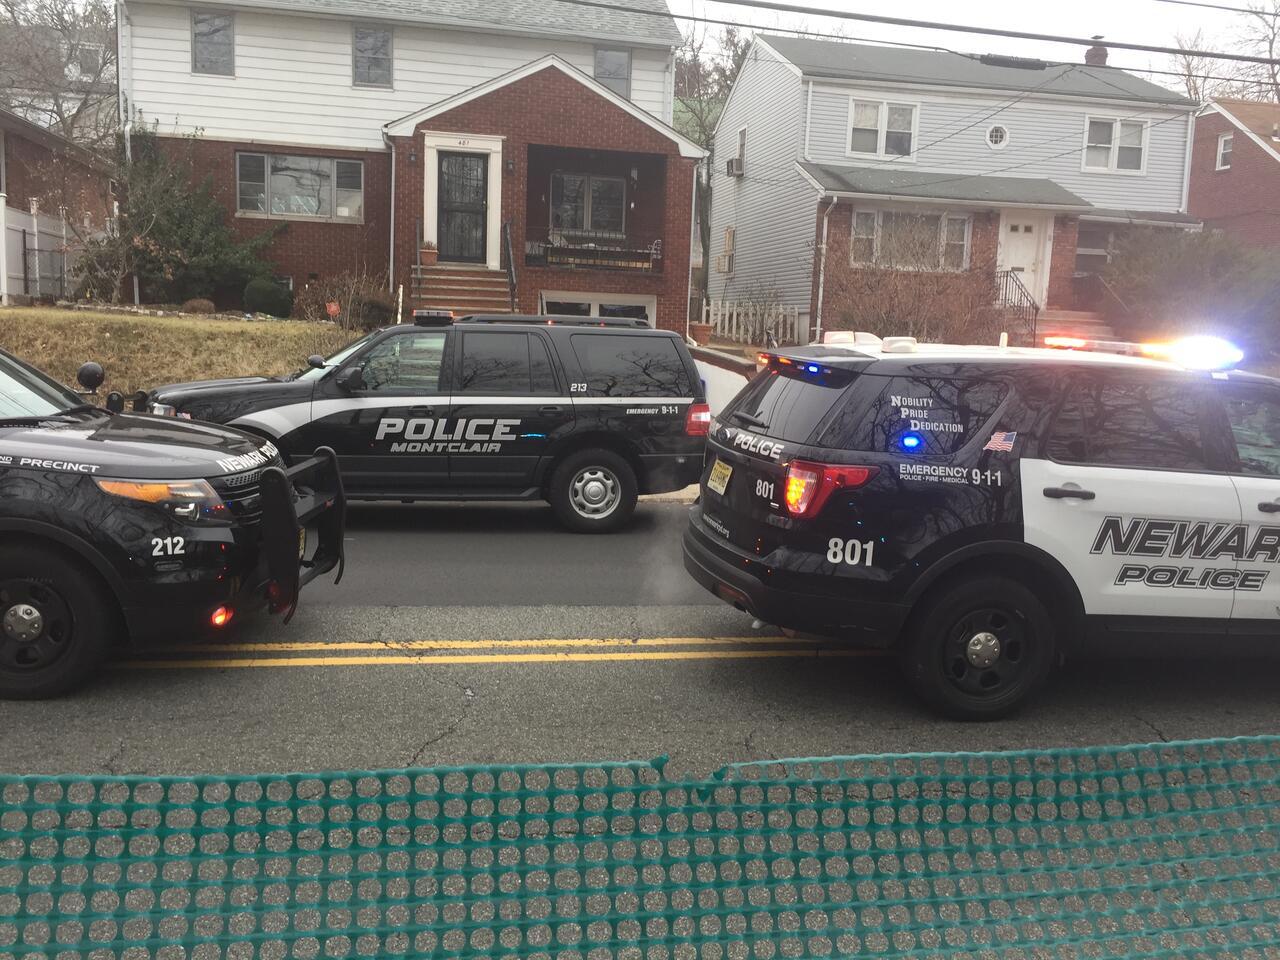 BREAKING BELLEVILLE-NEWARK NJ: High Speed Pursuit, Crash